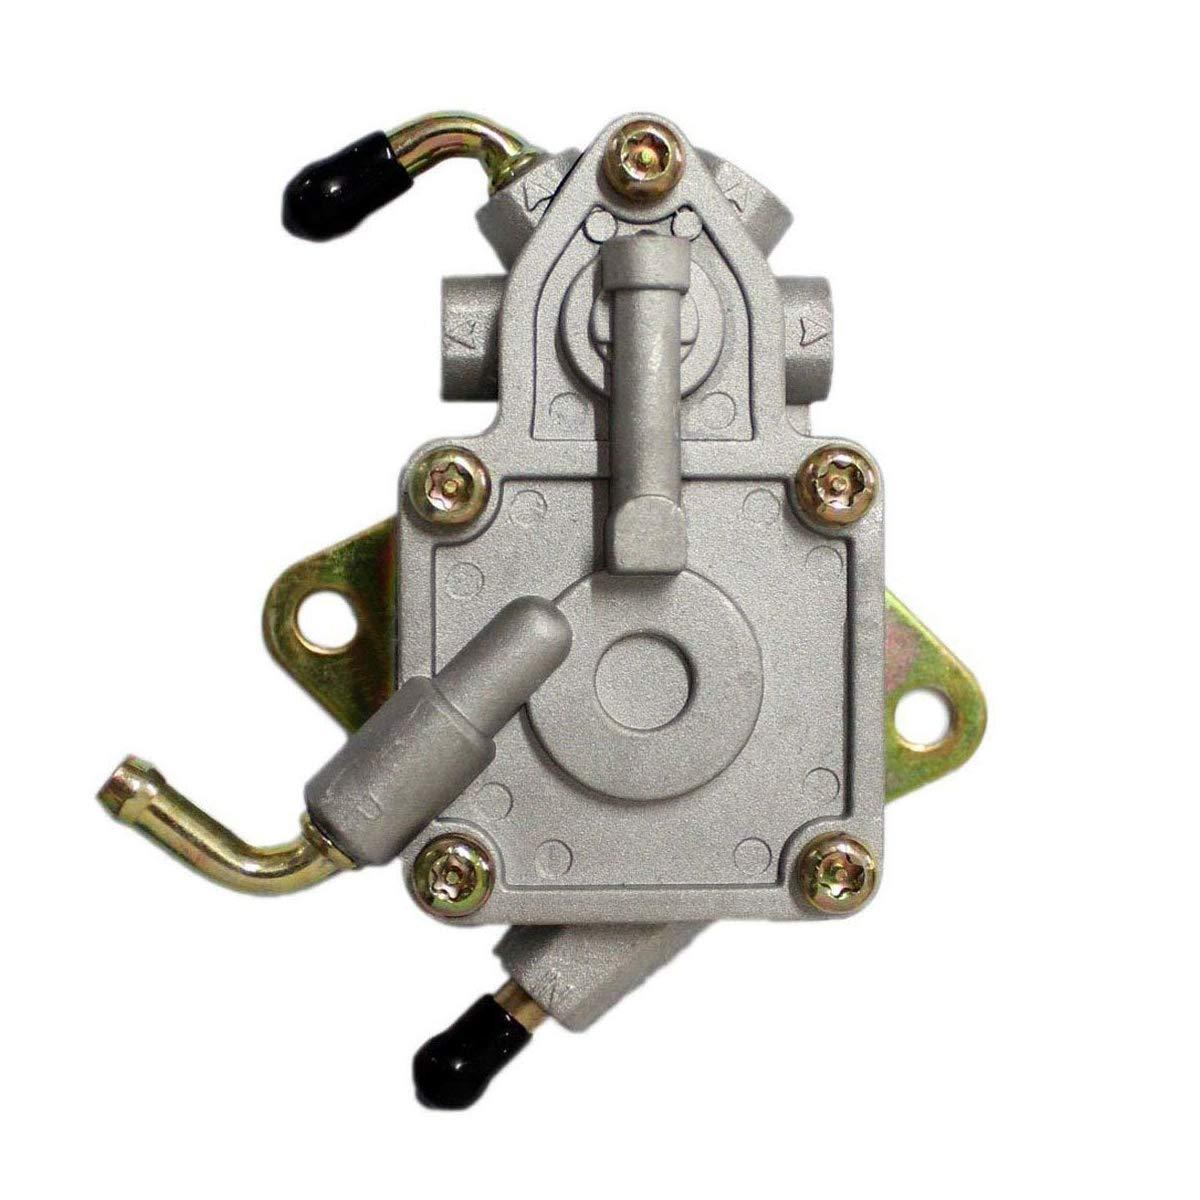 New Fuel Pump Fits for Yamaha Rhino 450 660 UTV YXR450 YXR660 Replace Part NO 5UG-13910-01-0 5UG13910010